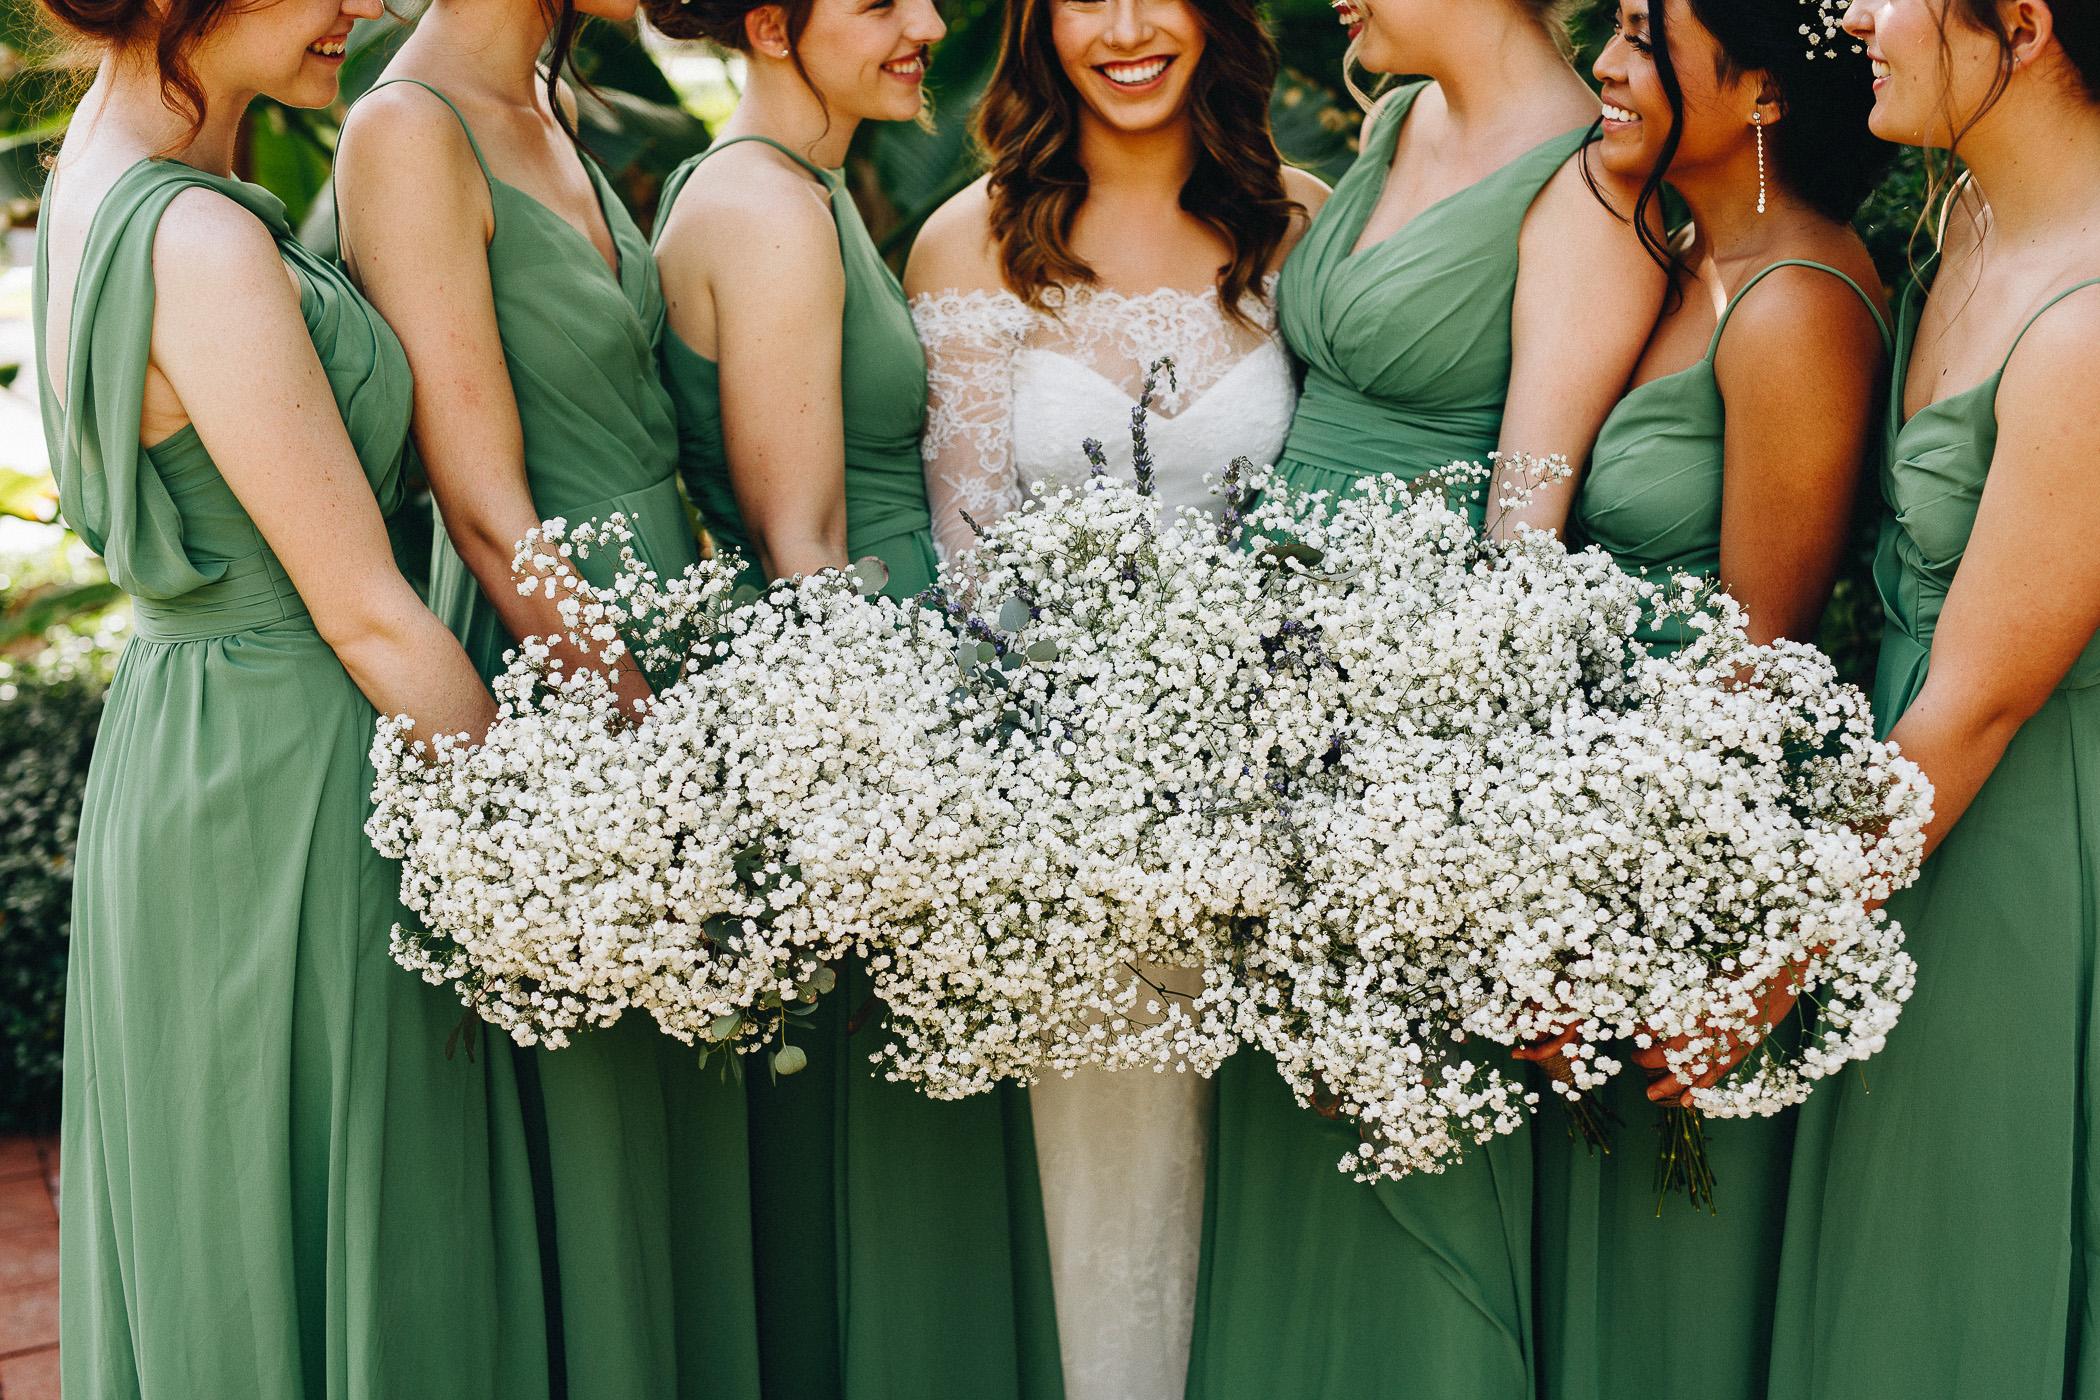 181104-Luxium-Weddings-Arizona-@matt__Le-Brandon-Kariana-Phoenix-Valley-Garden-Center-1018.jpg